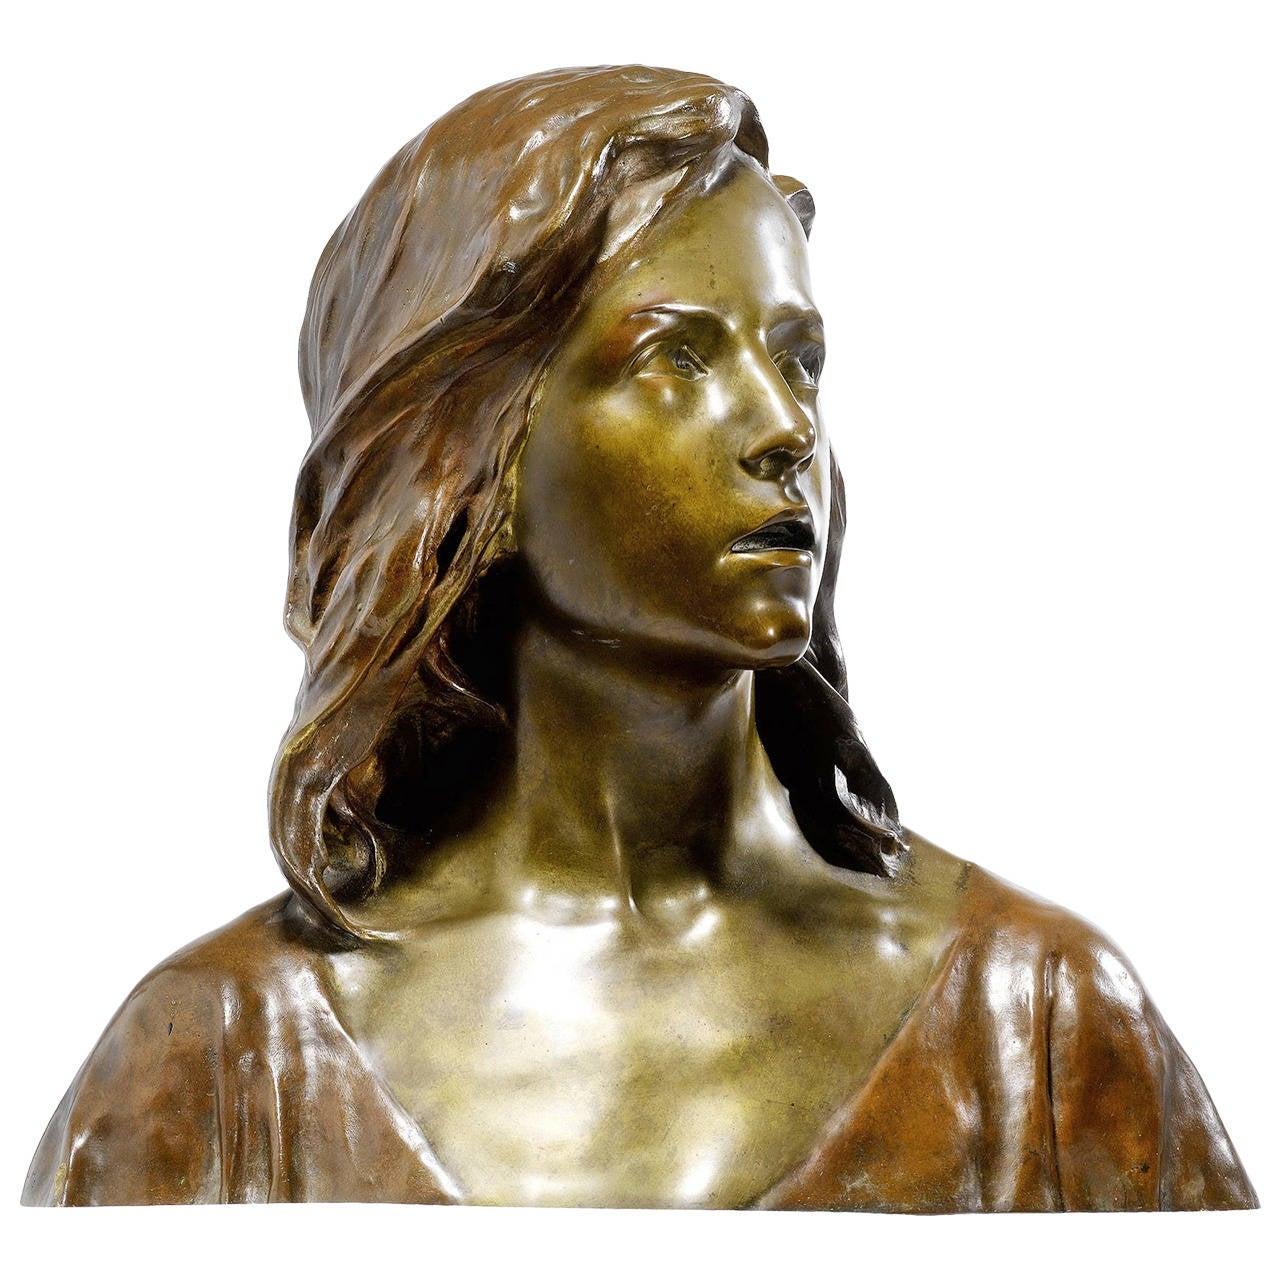 Art Nouveau Period Patinated Bronze Bust of Jesus Christ by F.R. Larche